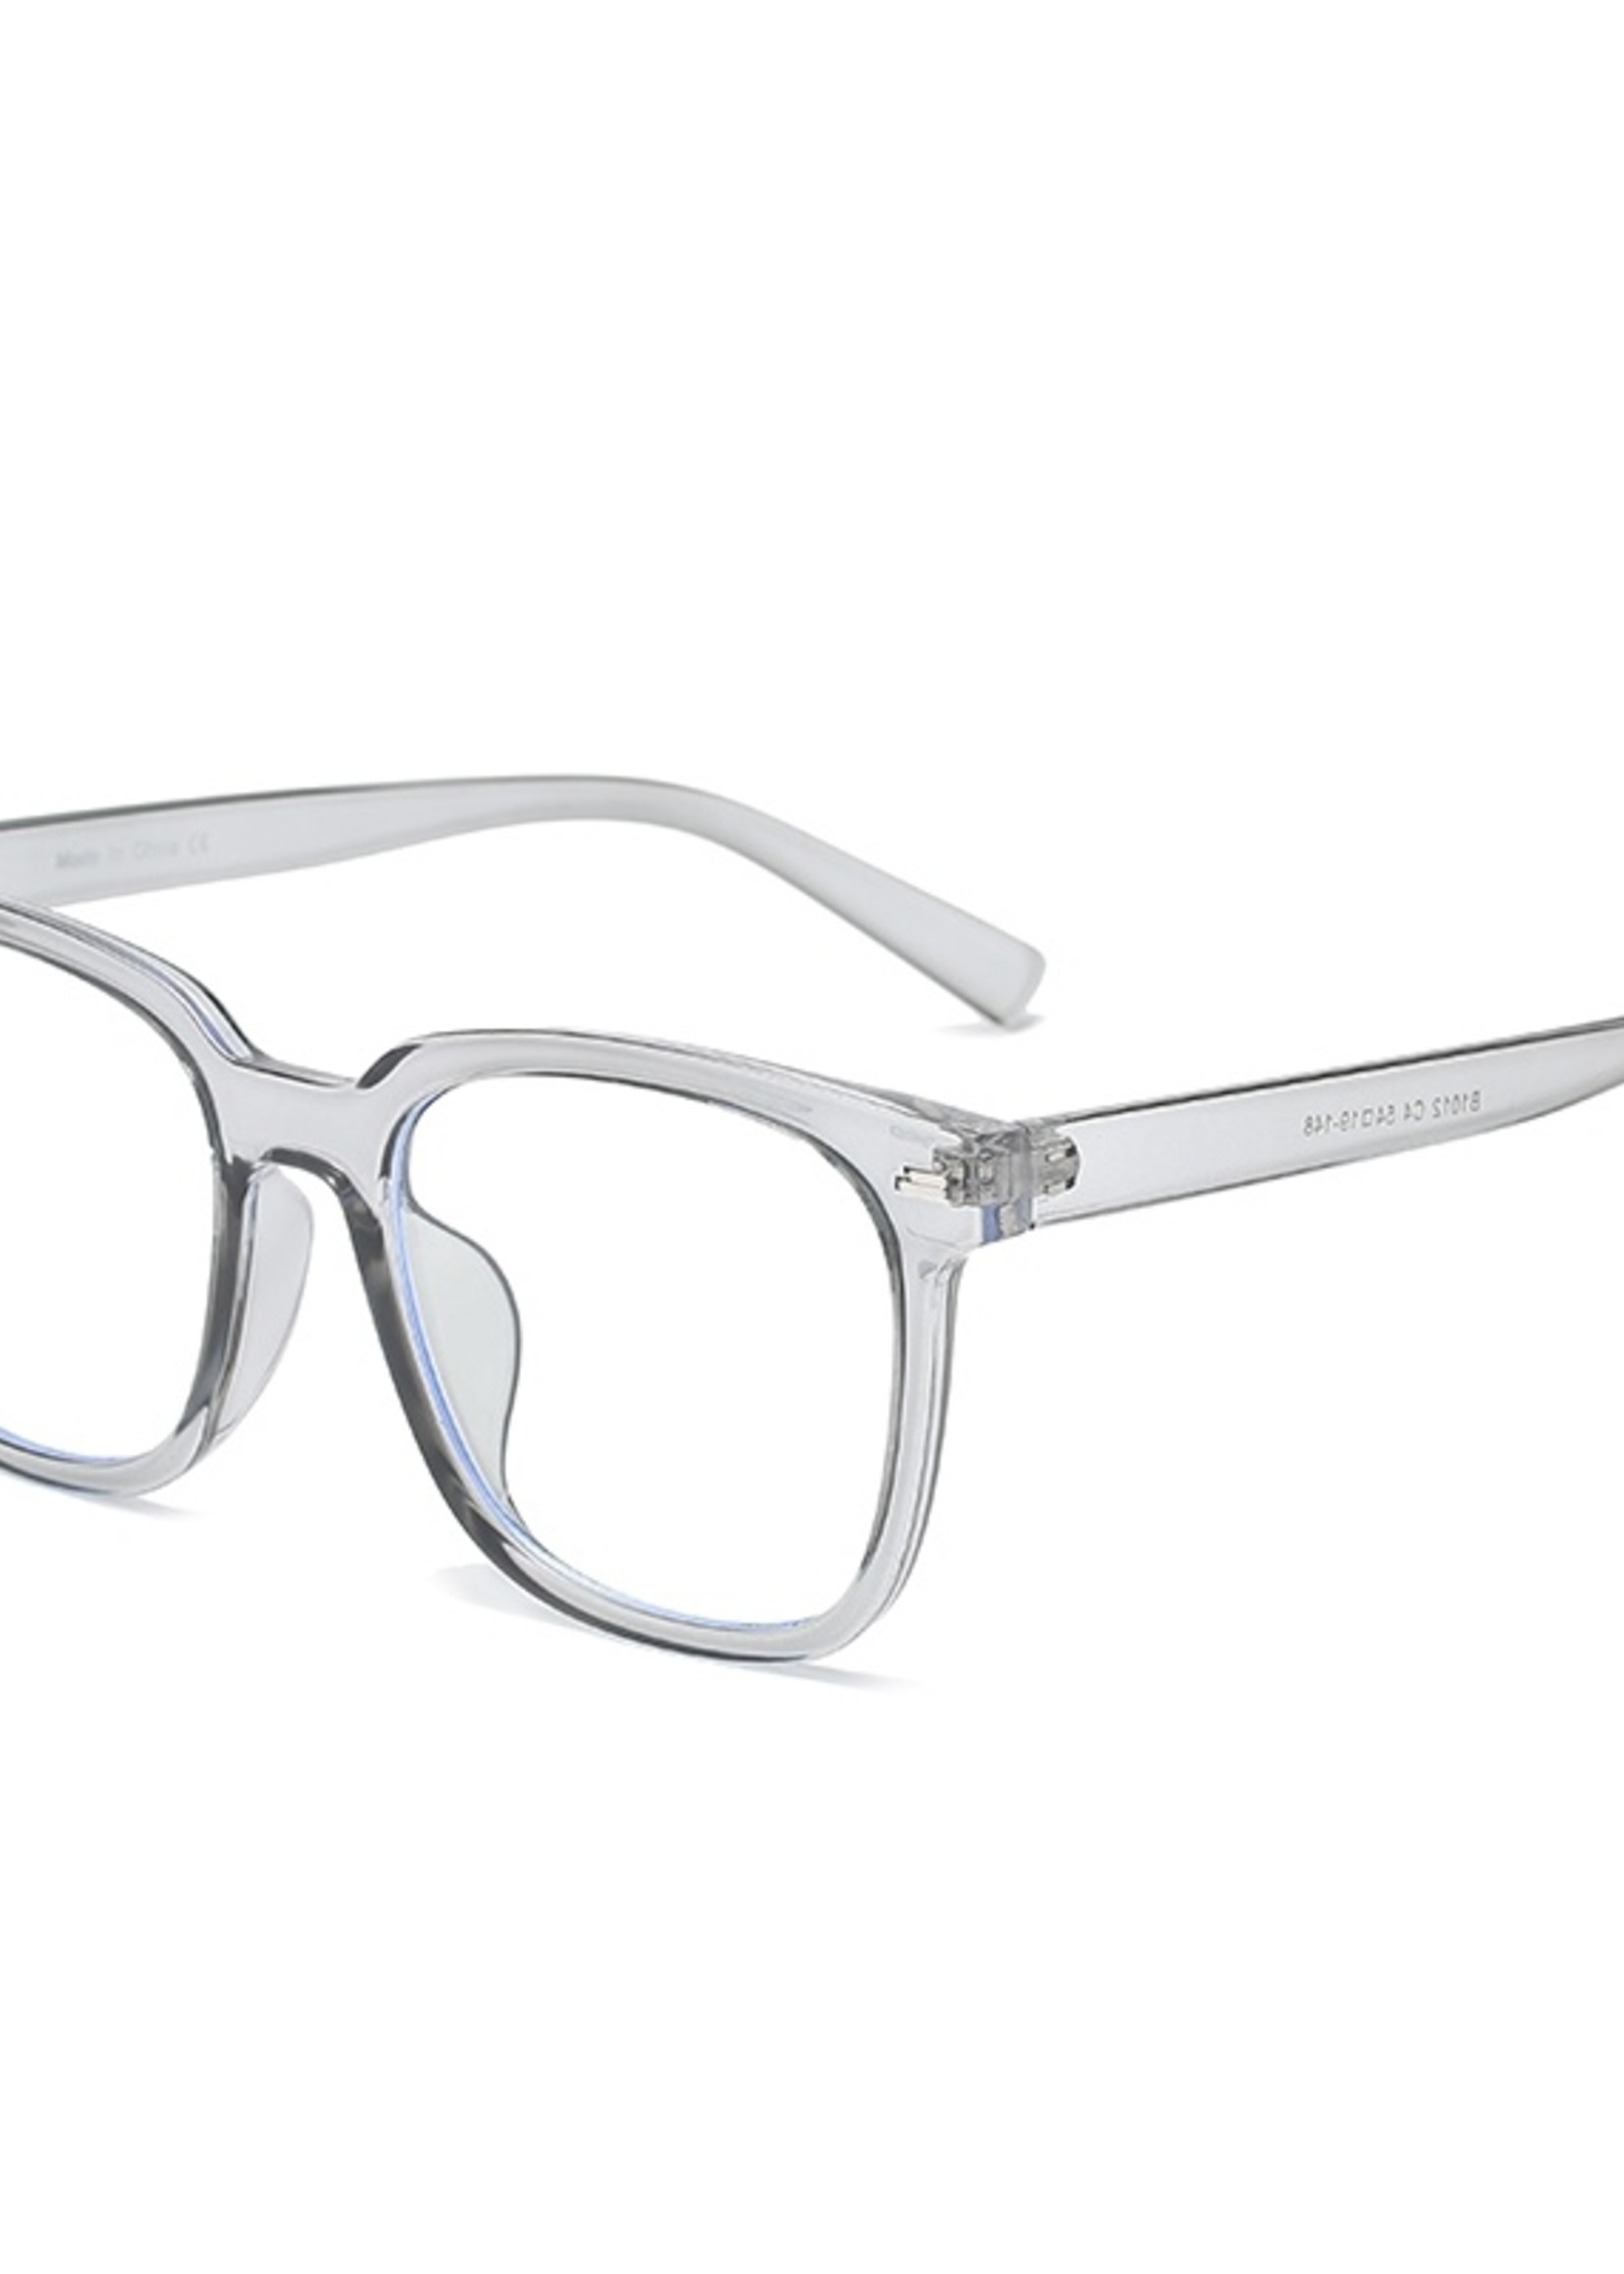 Brooklyn   Blue Light Blocking Glasses